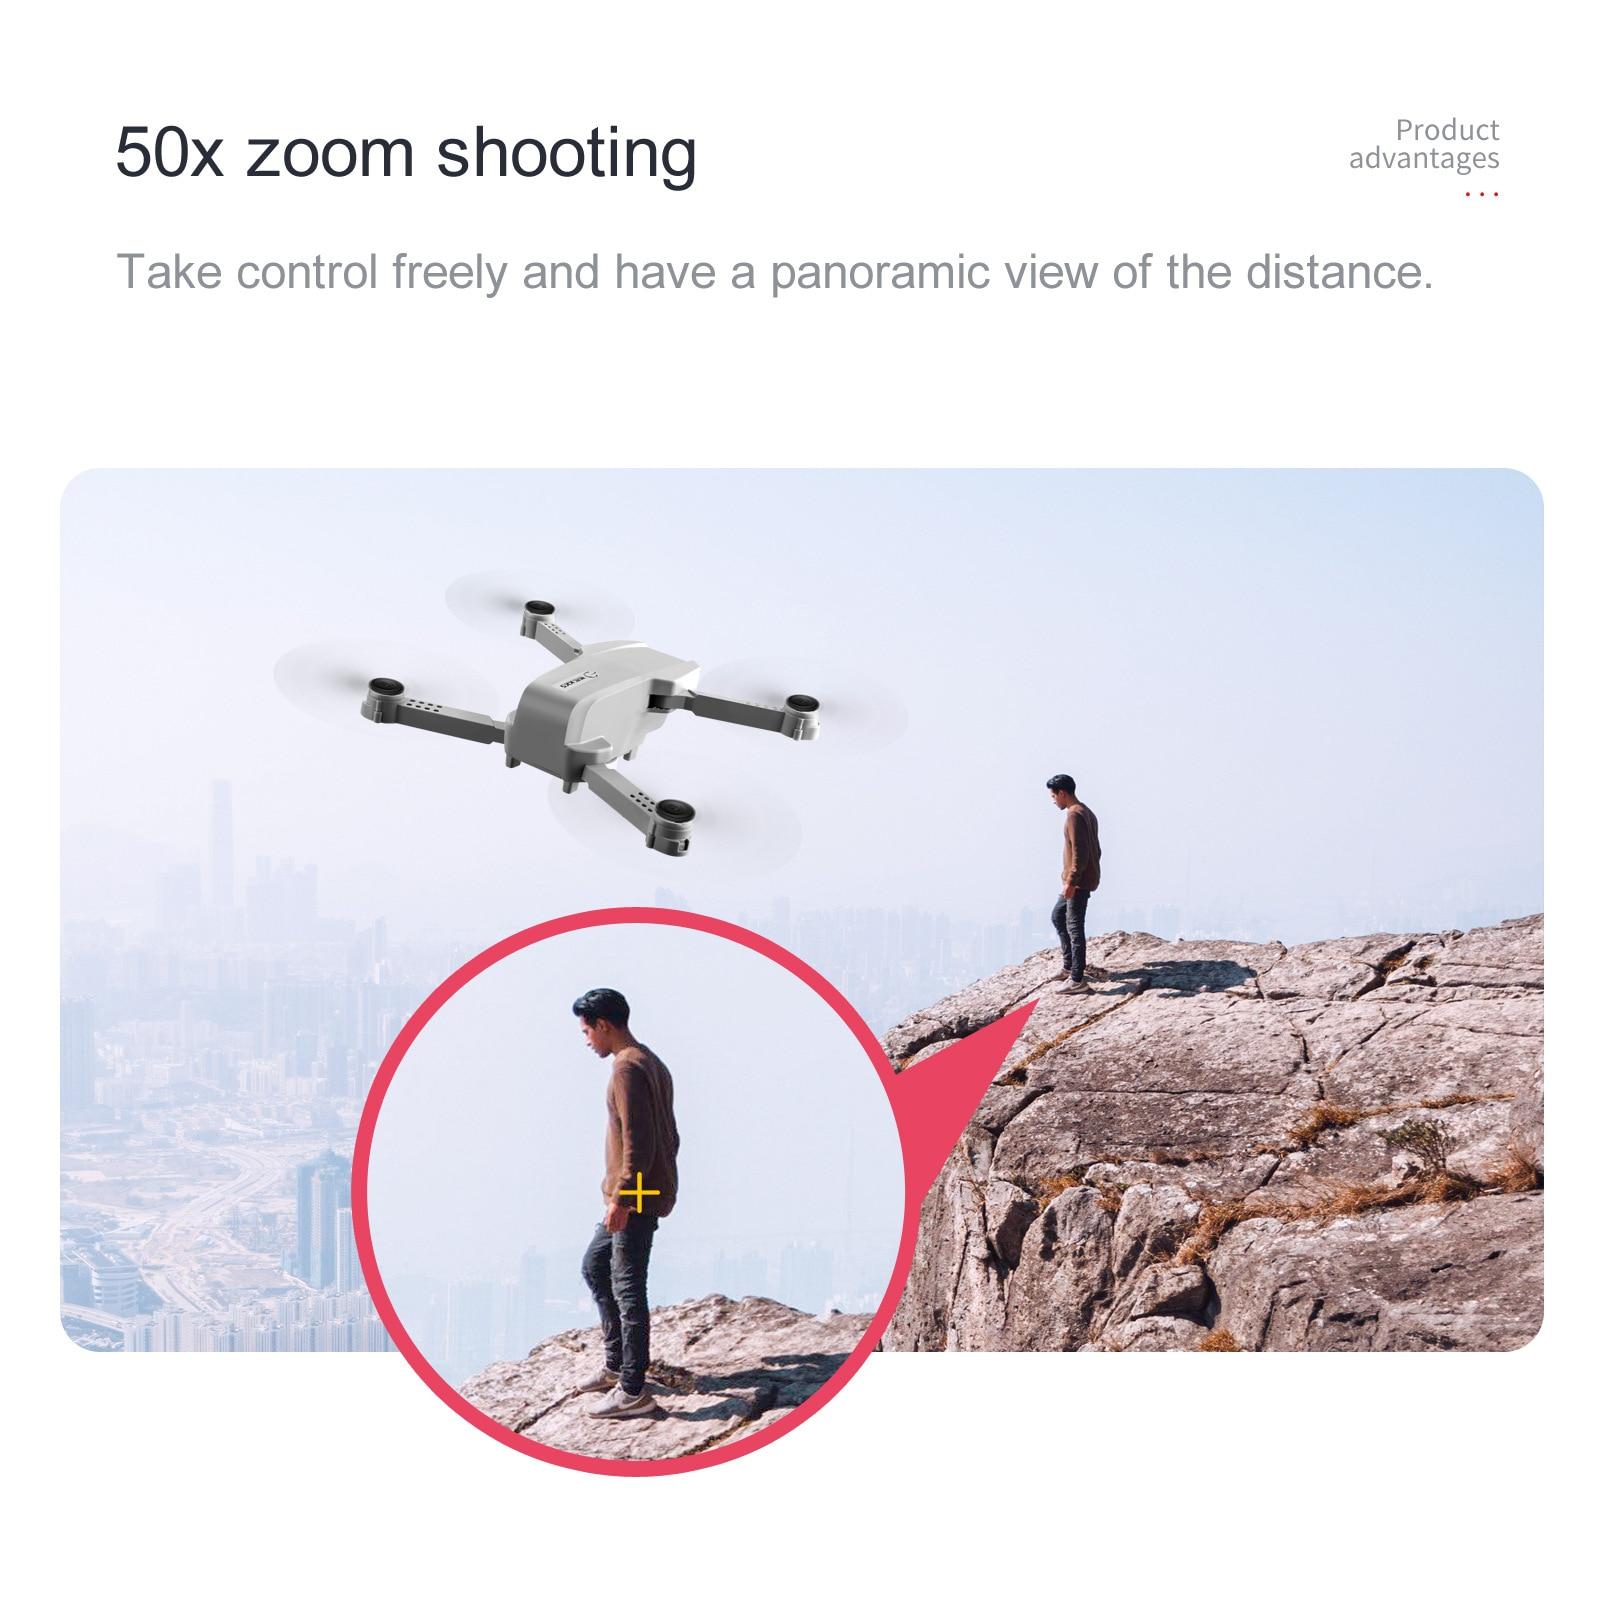 KK5 Drone 4k HD Wide Angle Camera WiFi Foldable Quadcopter